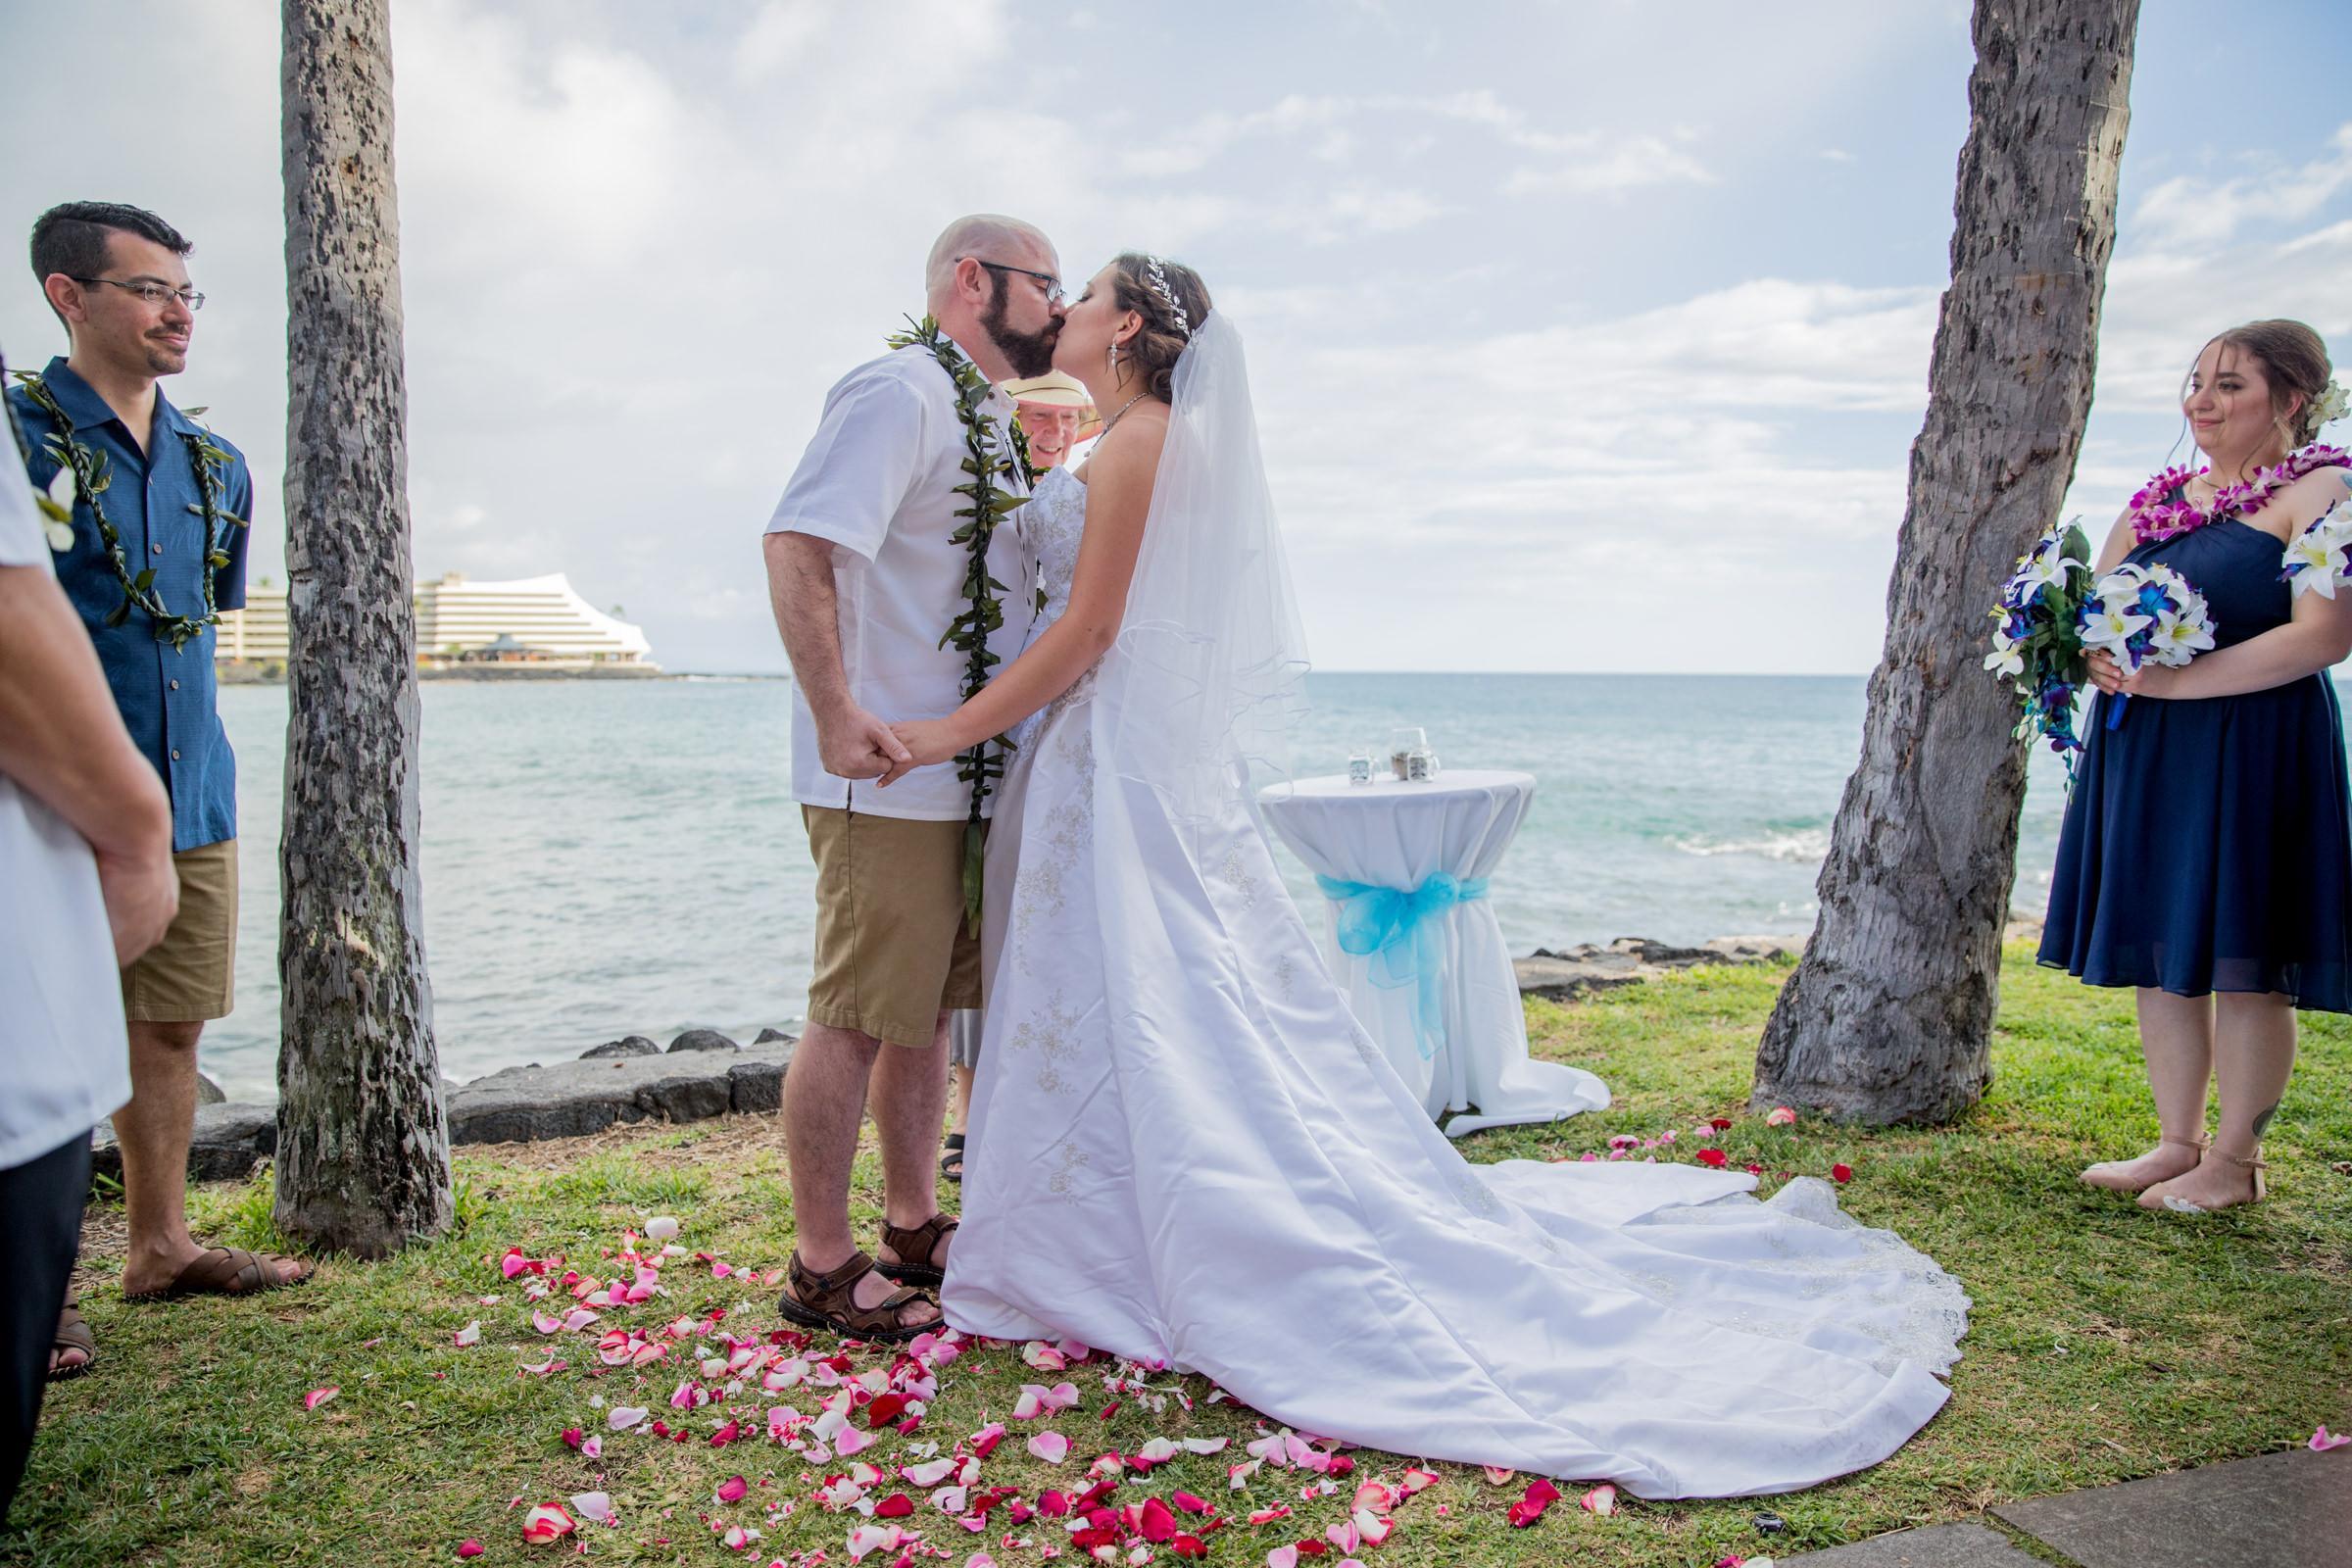 wedding-photographer-photography-destination-hawaii-lake-tahoe-ceremony-first-kiss